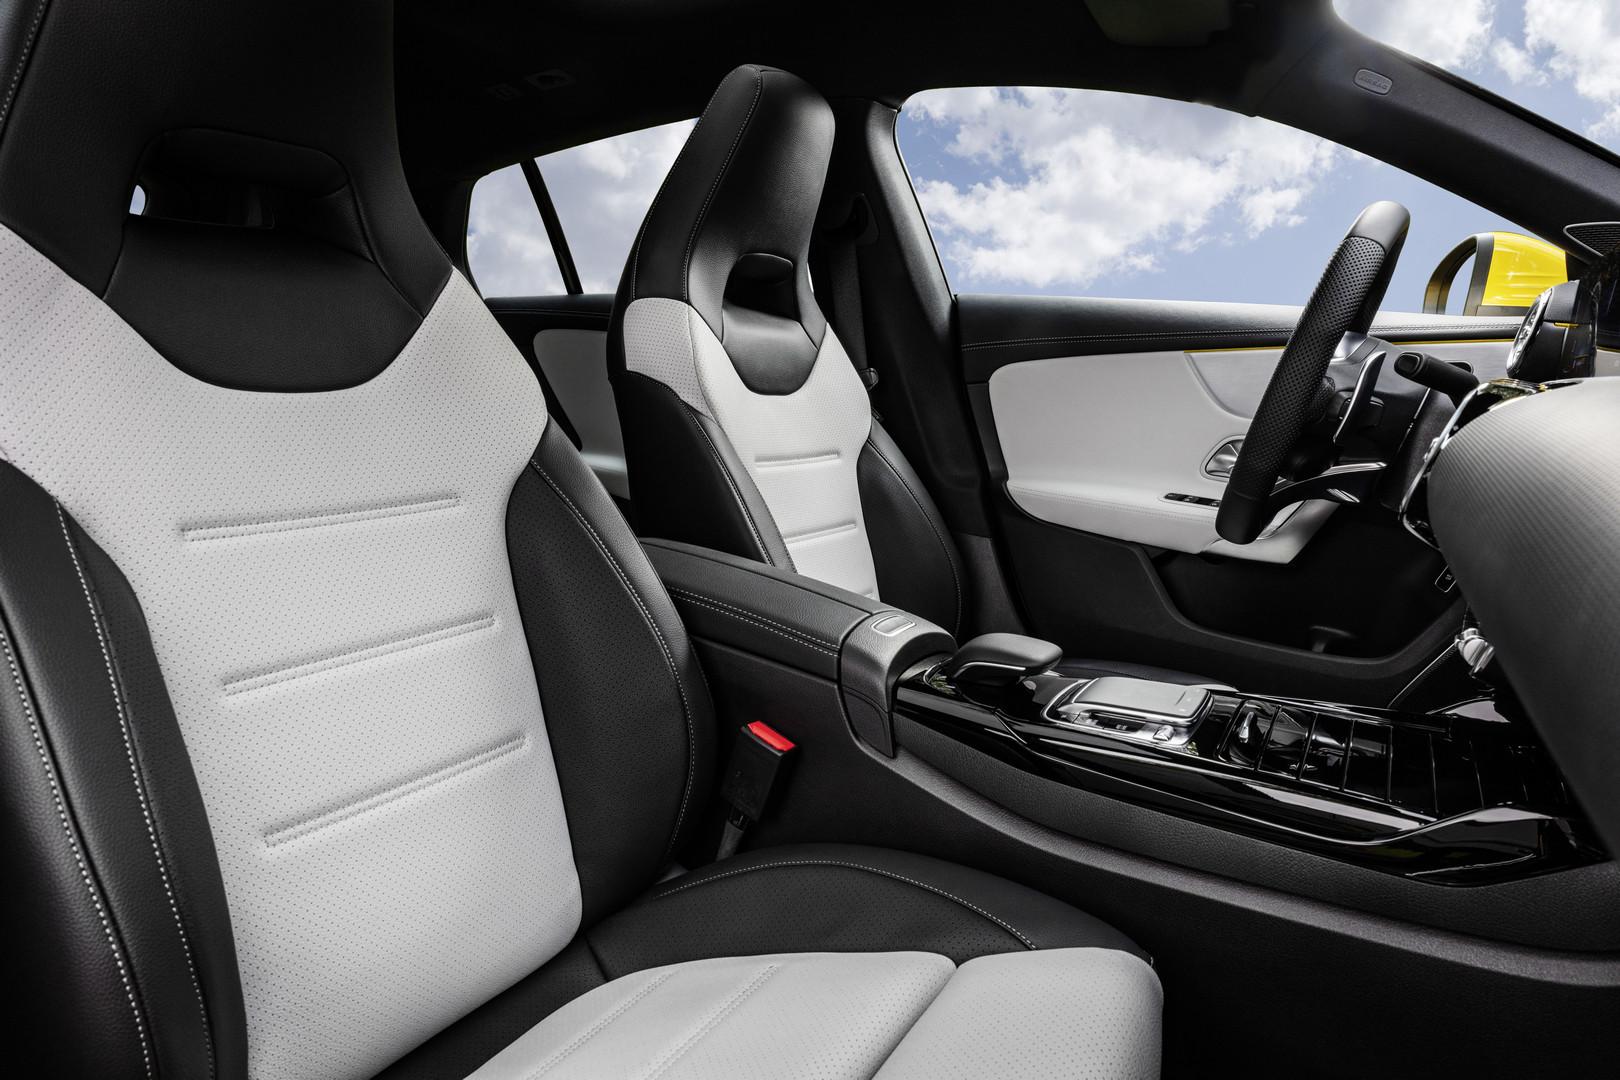 Mercedes-AMG CLA 35 Seats